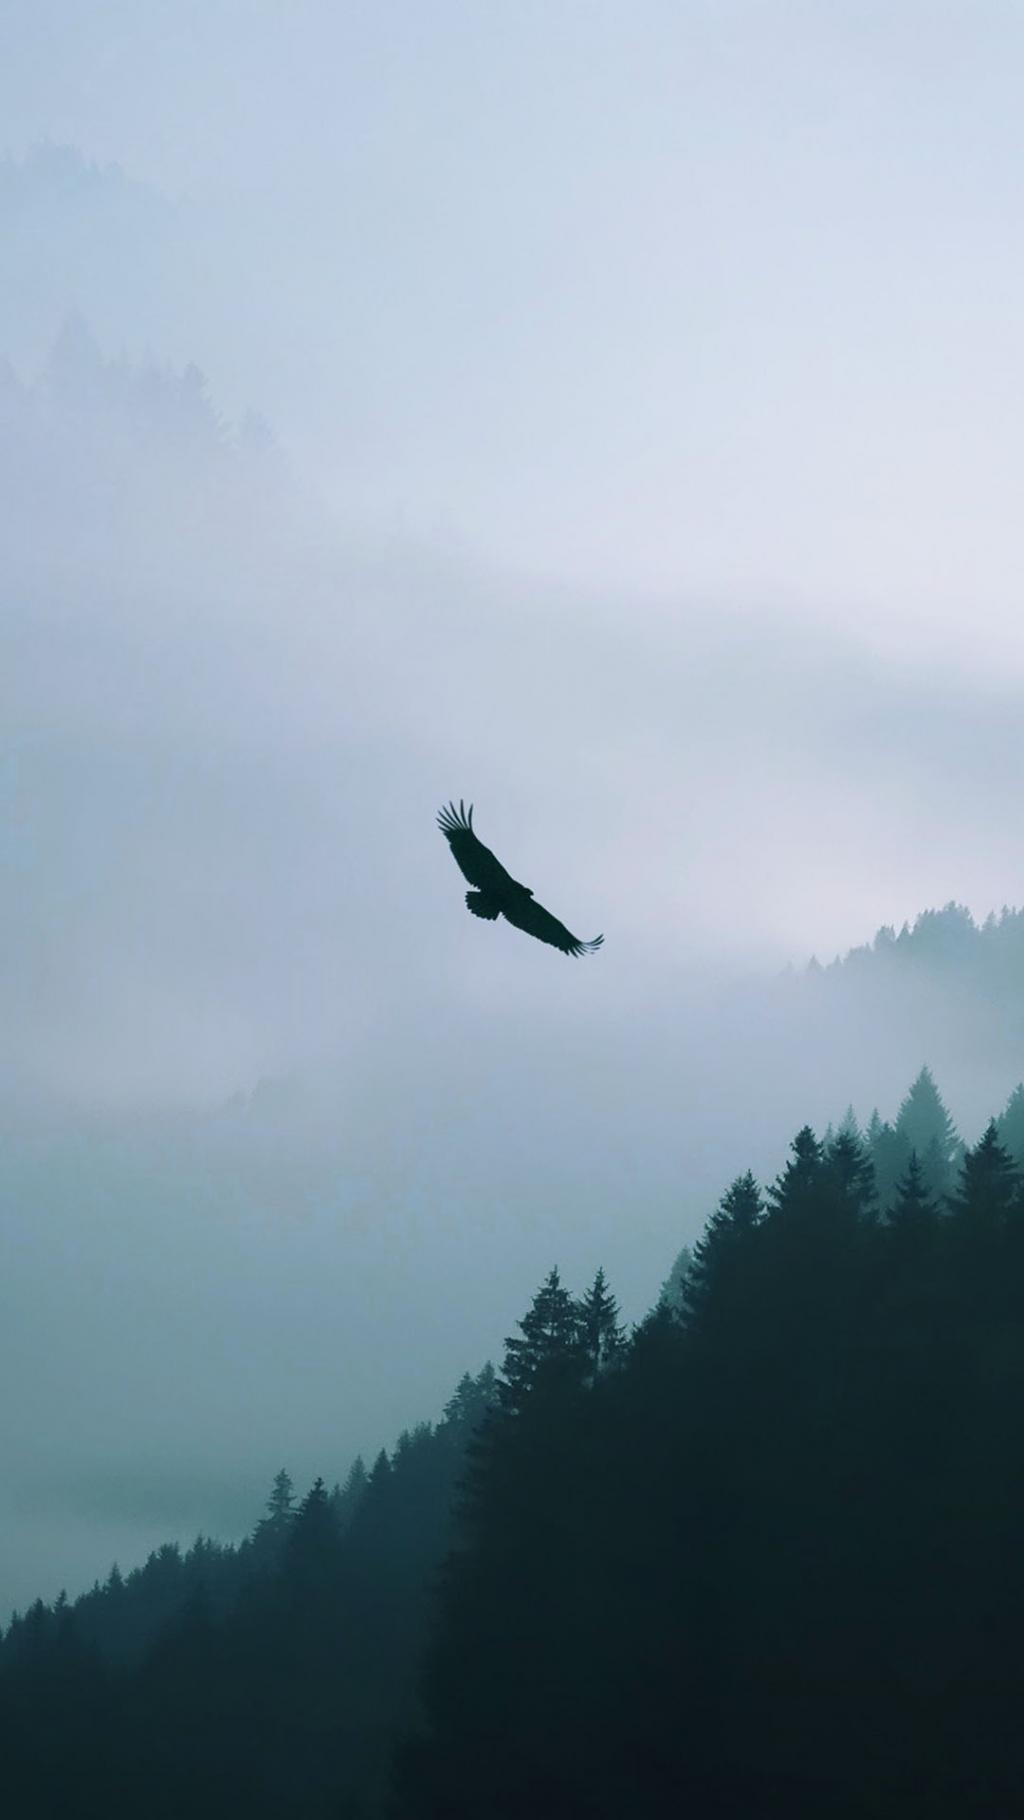 Iphone Plus Wallpaper 鹰飞越迷雾森林 锁屏图片 高清手机壁纸 动物 回车桌面